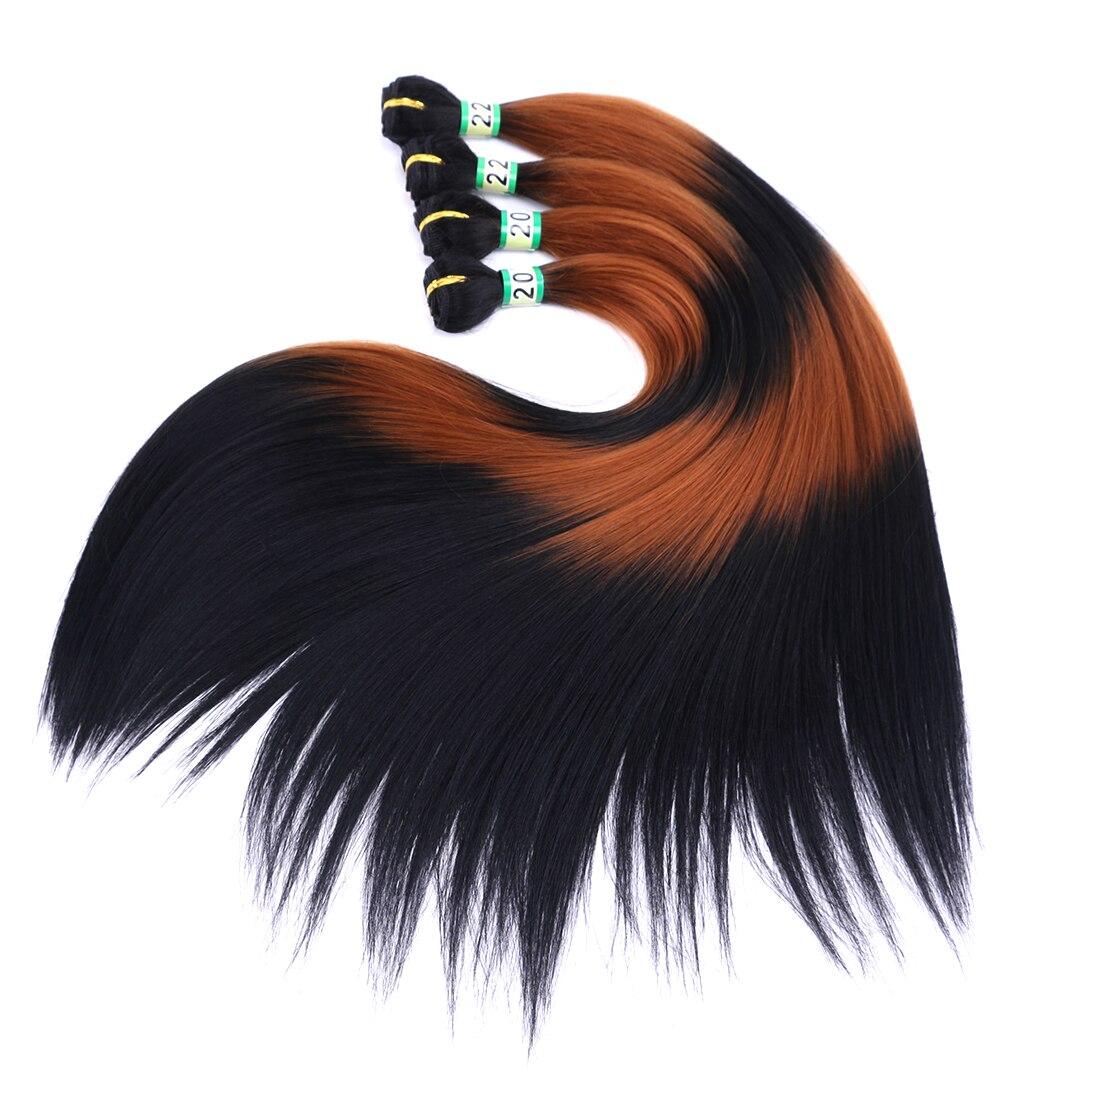 do cabelo sintético fibra de alta temperatura